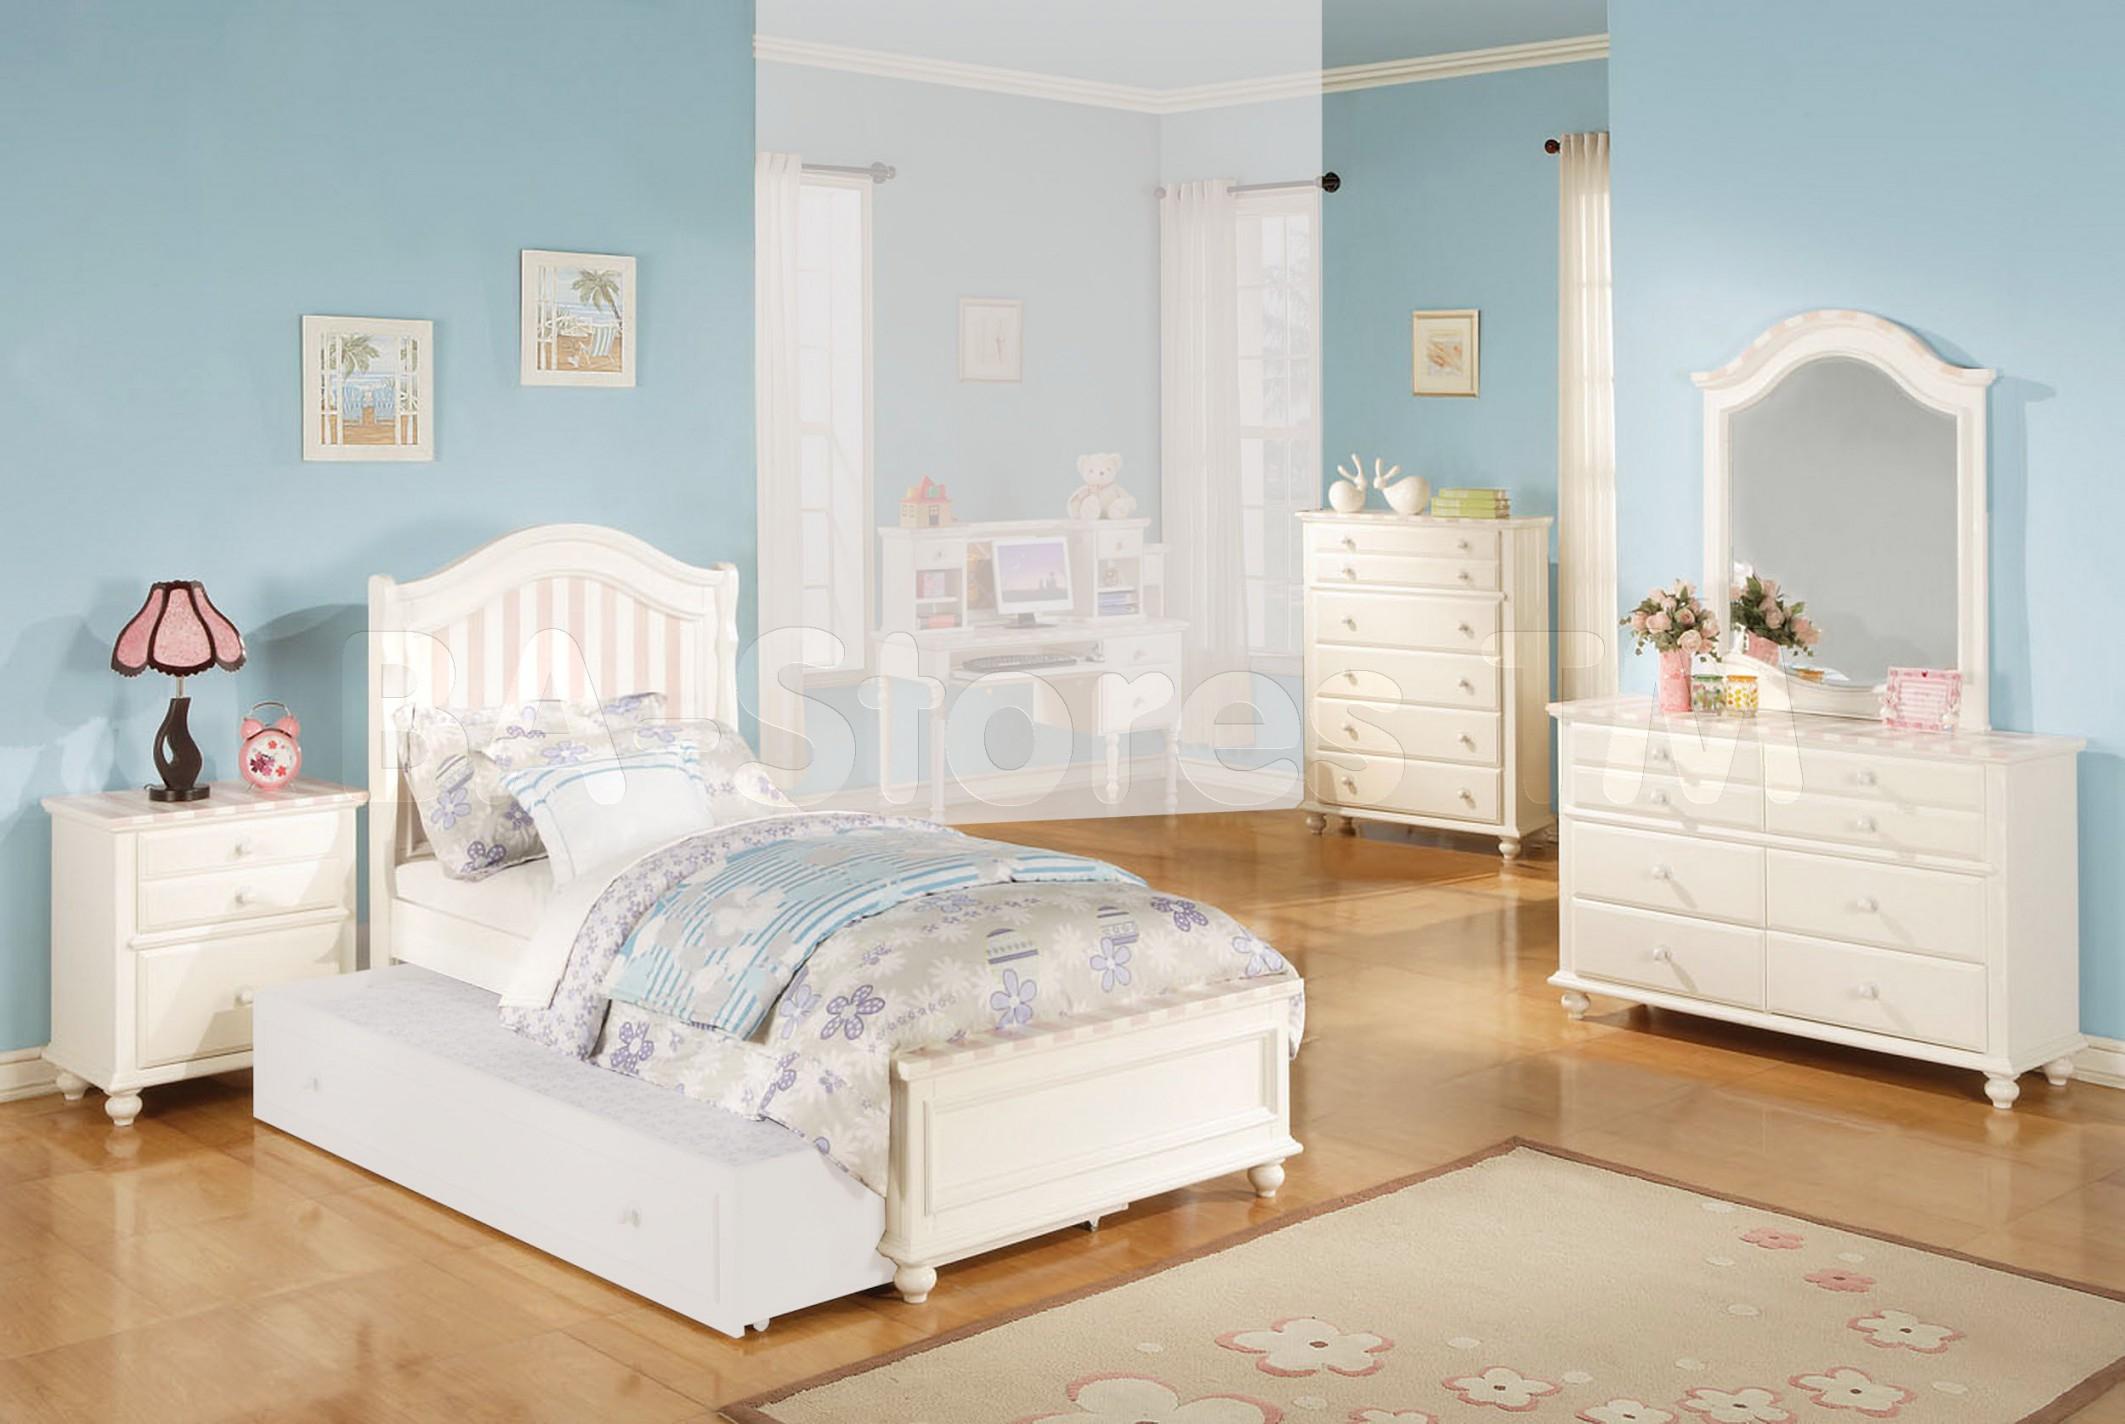 affordable bedroom furniture for girls photo - 4